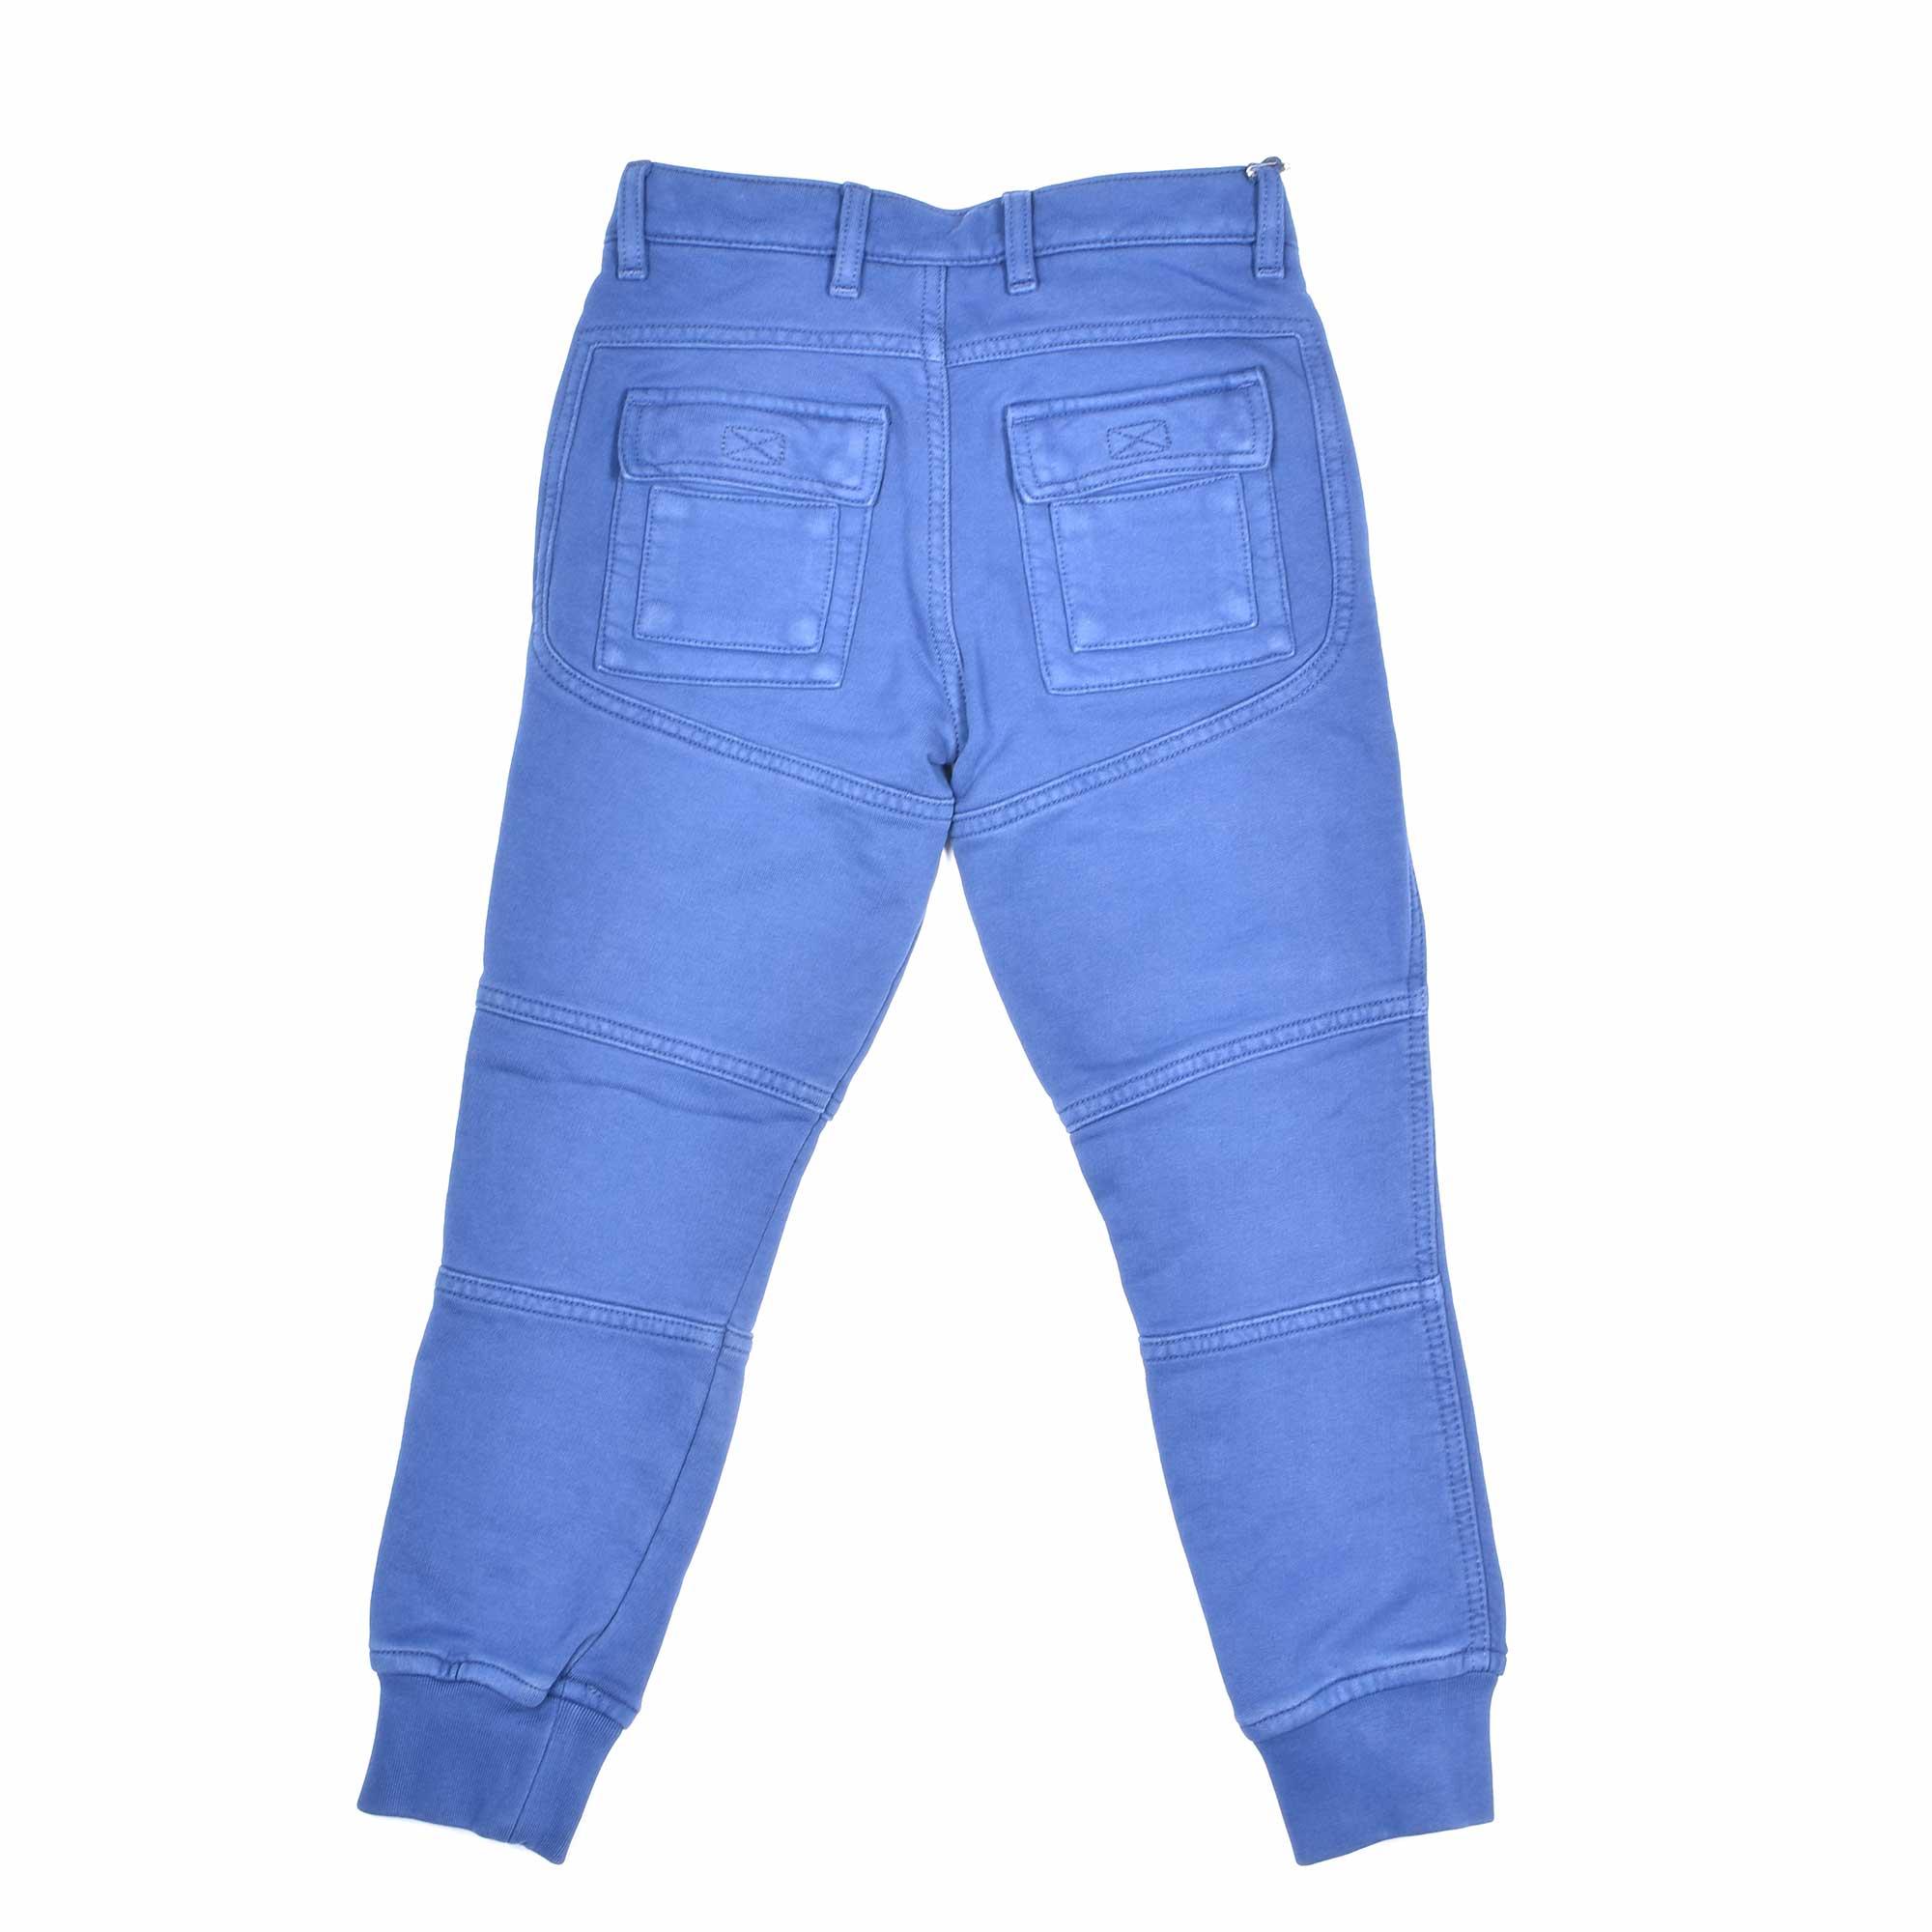 Pantalone felpa anti g - Blu inchiostro